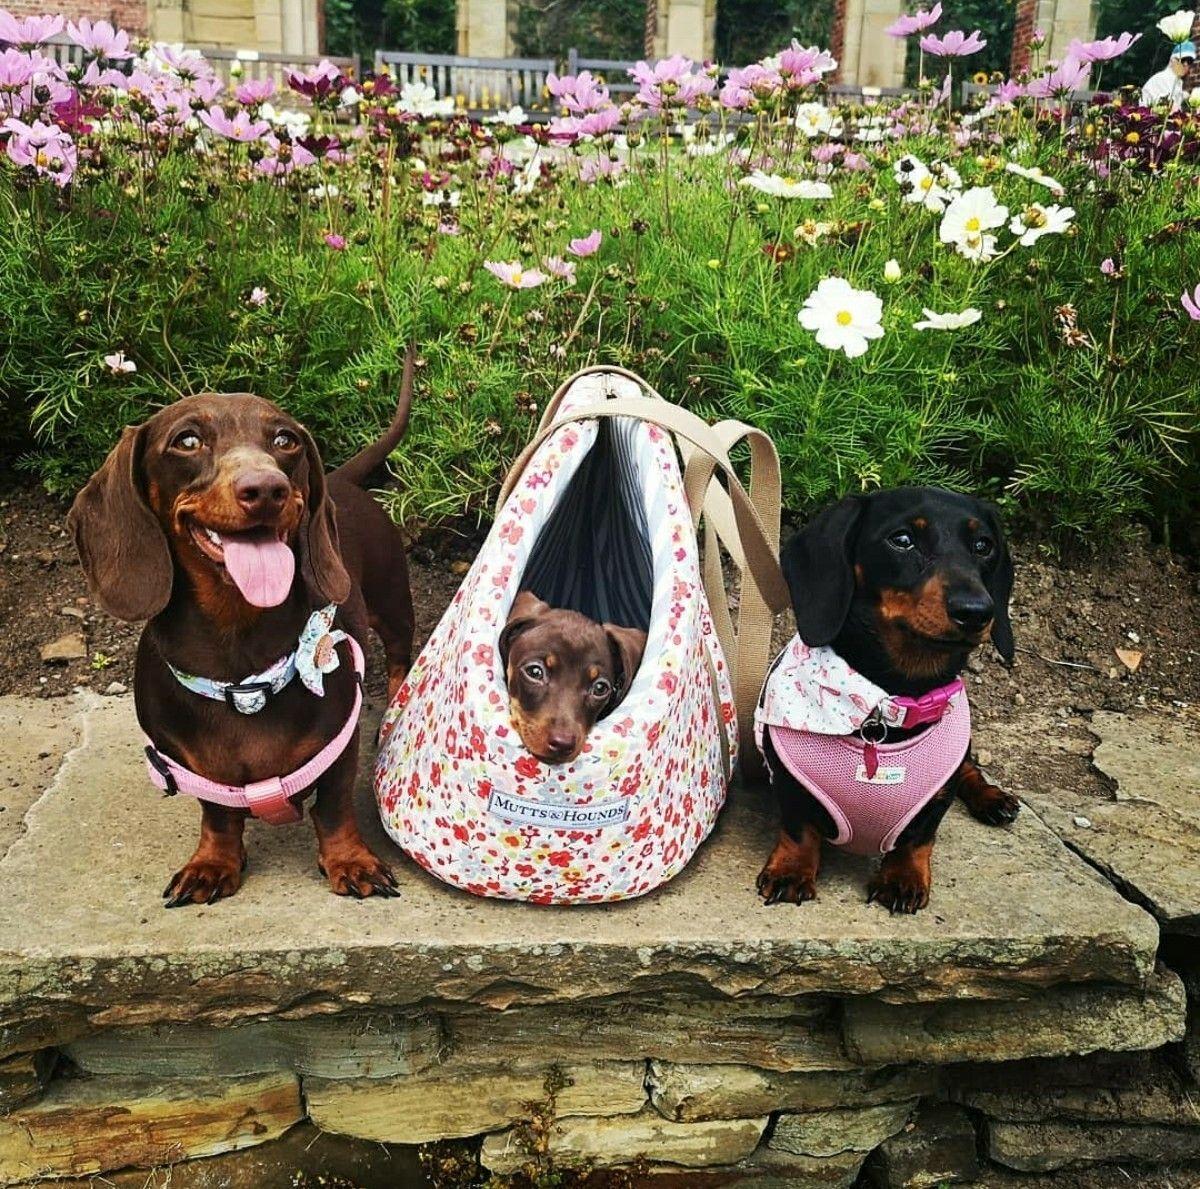 Dachshund Family Dachshund Dachshund Love Dachshund Puppies